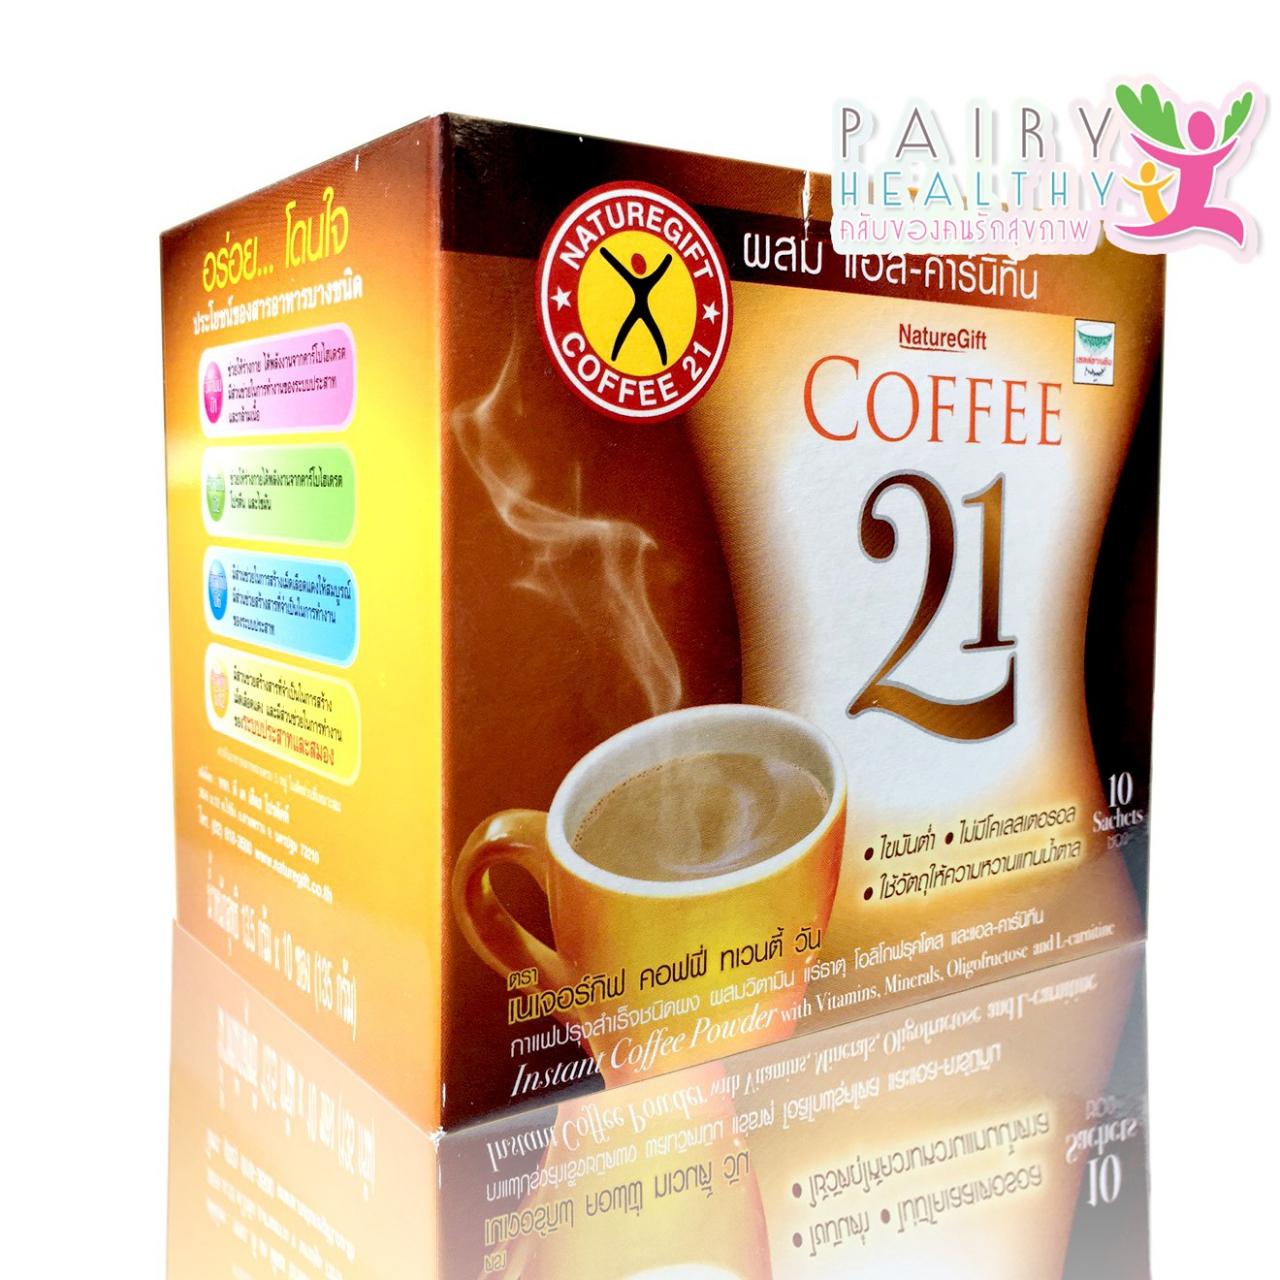 NatureGift Coffee21 10 ซอง เนเจอร์กิฟ คอฟฟี่ทเวนตี้วัน (ค่าส่ง EMS 50)